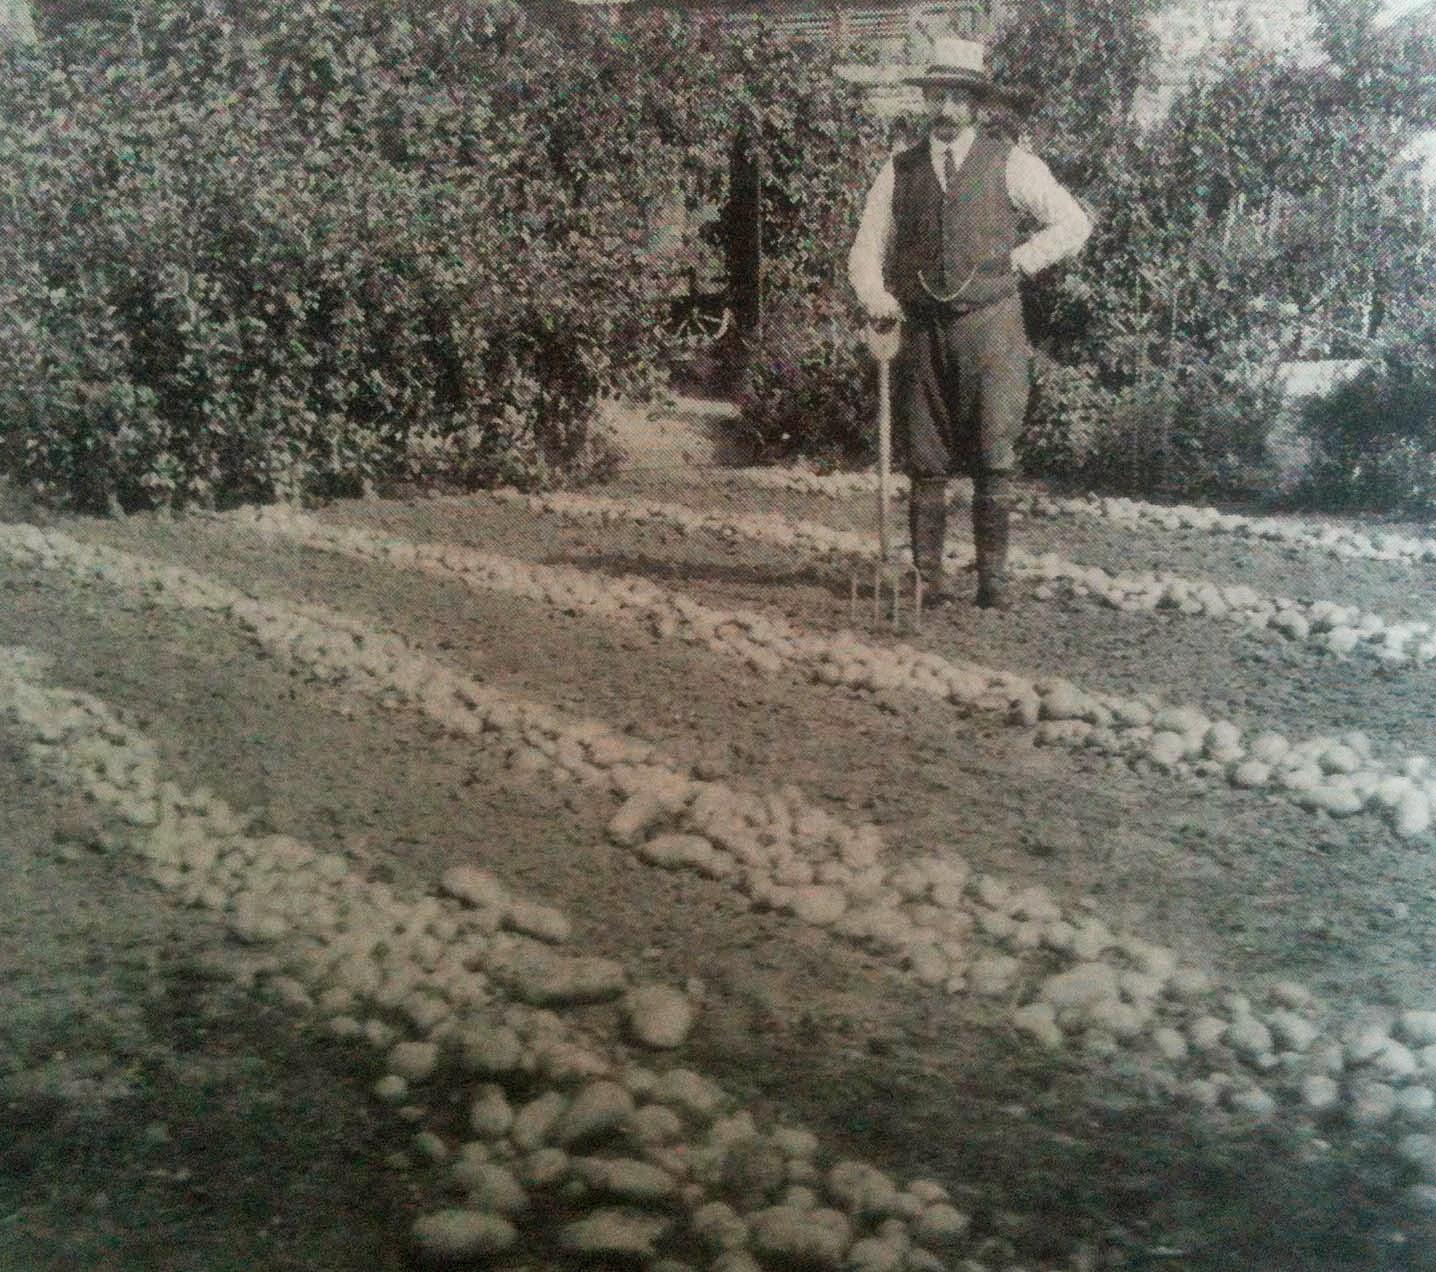 Don't buy into the myth of abundance, buy into food growing.